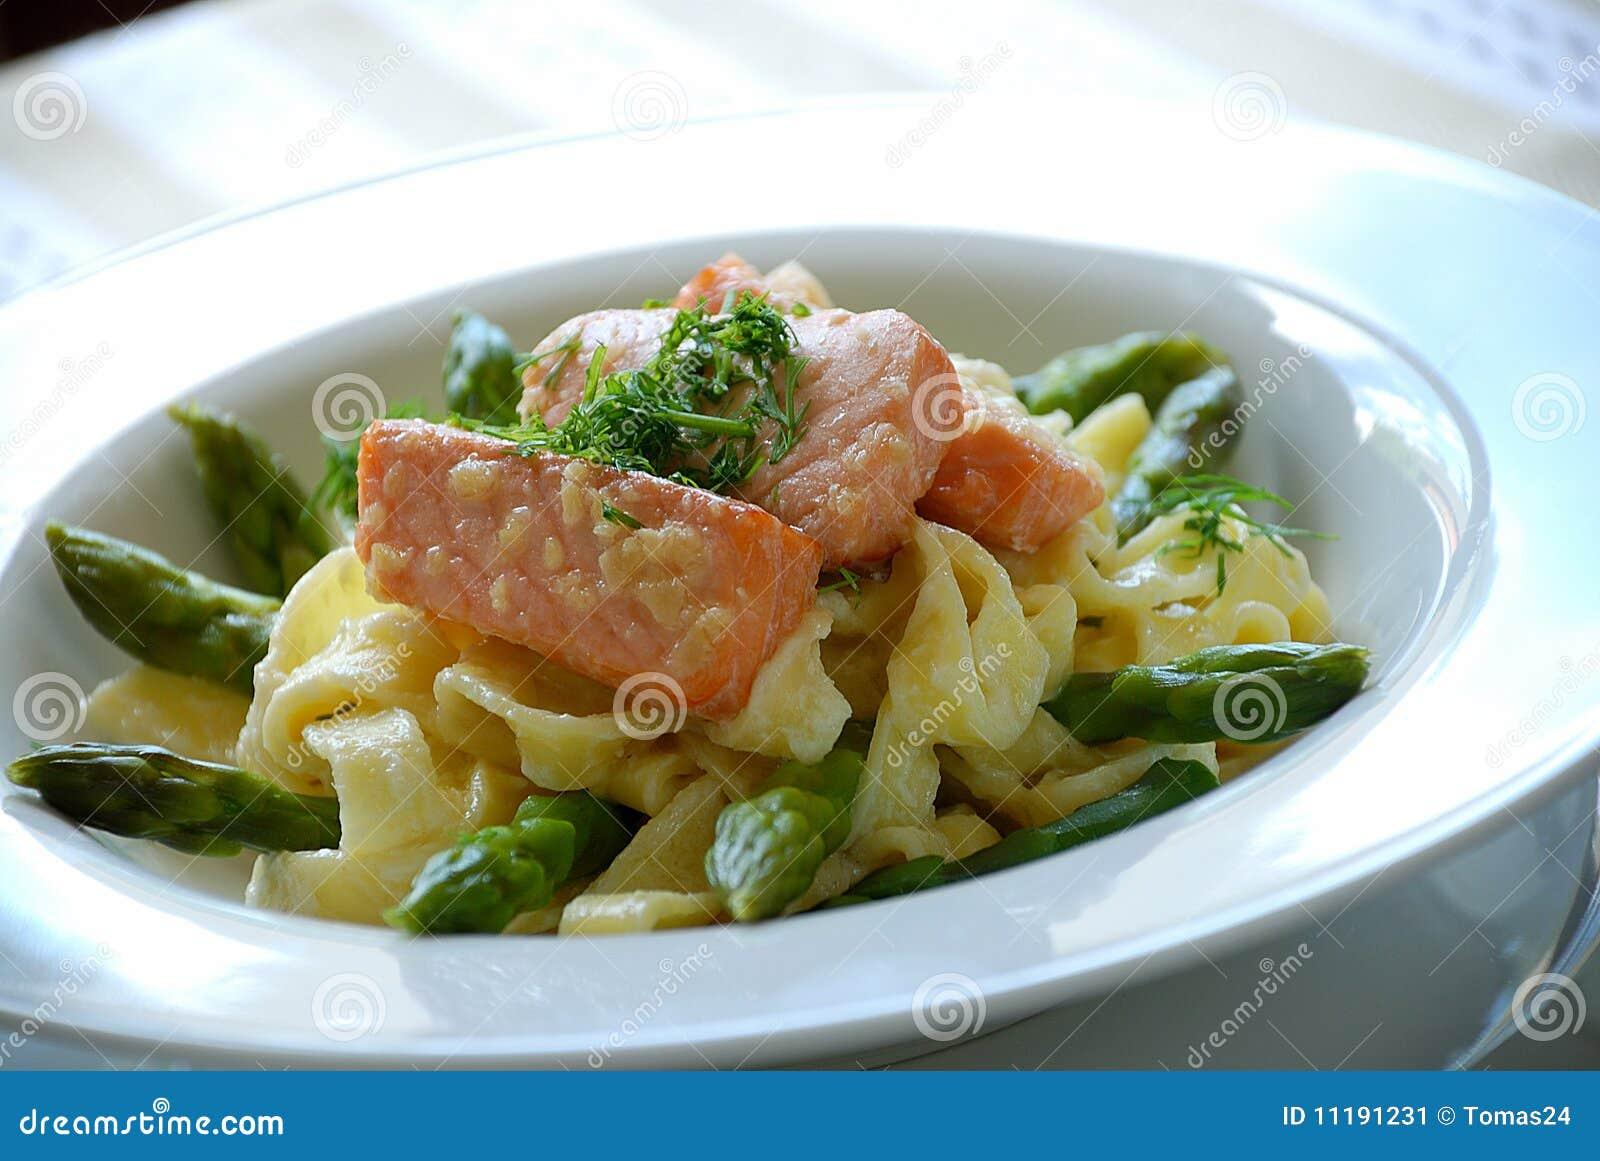 More similar stock images of ` Smoked salmon pasta `